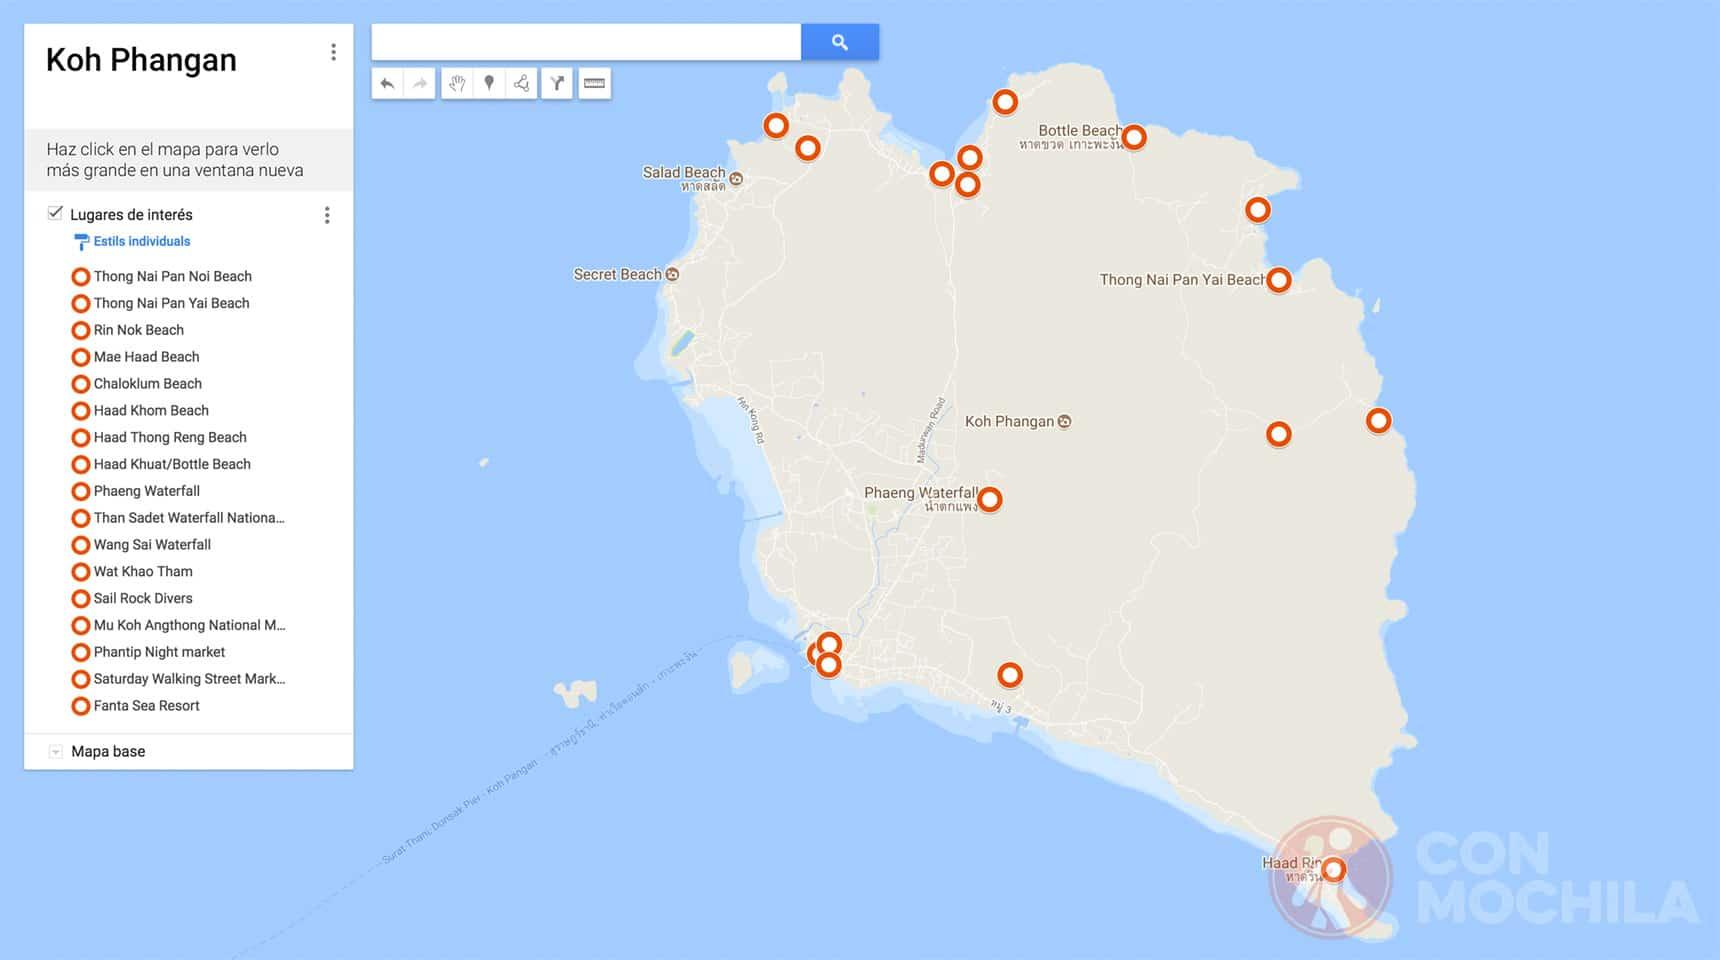 Mapa de Koh Phangan